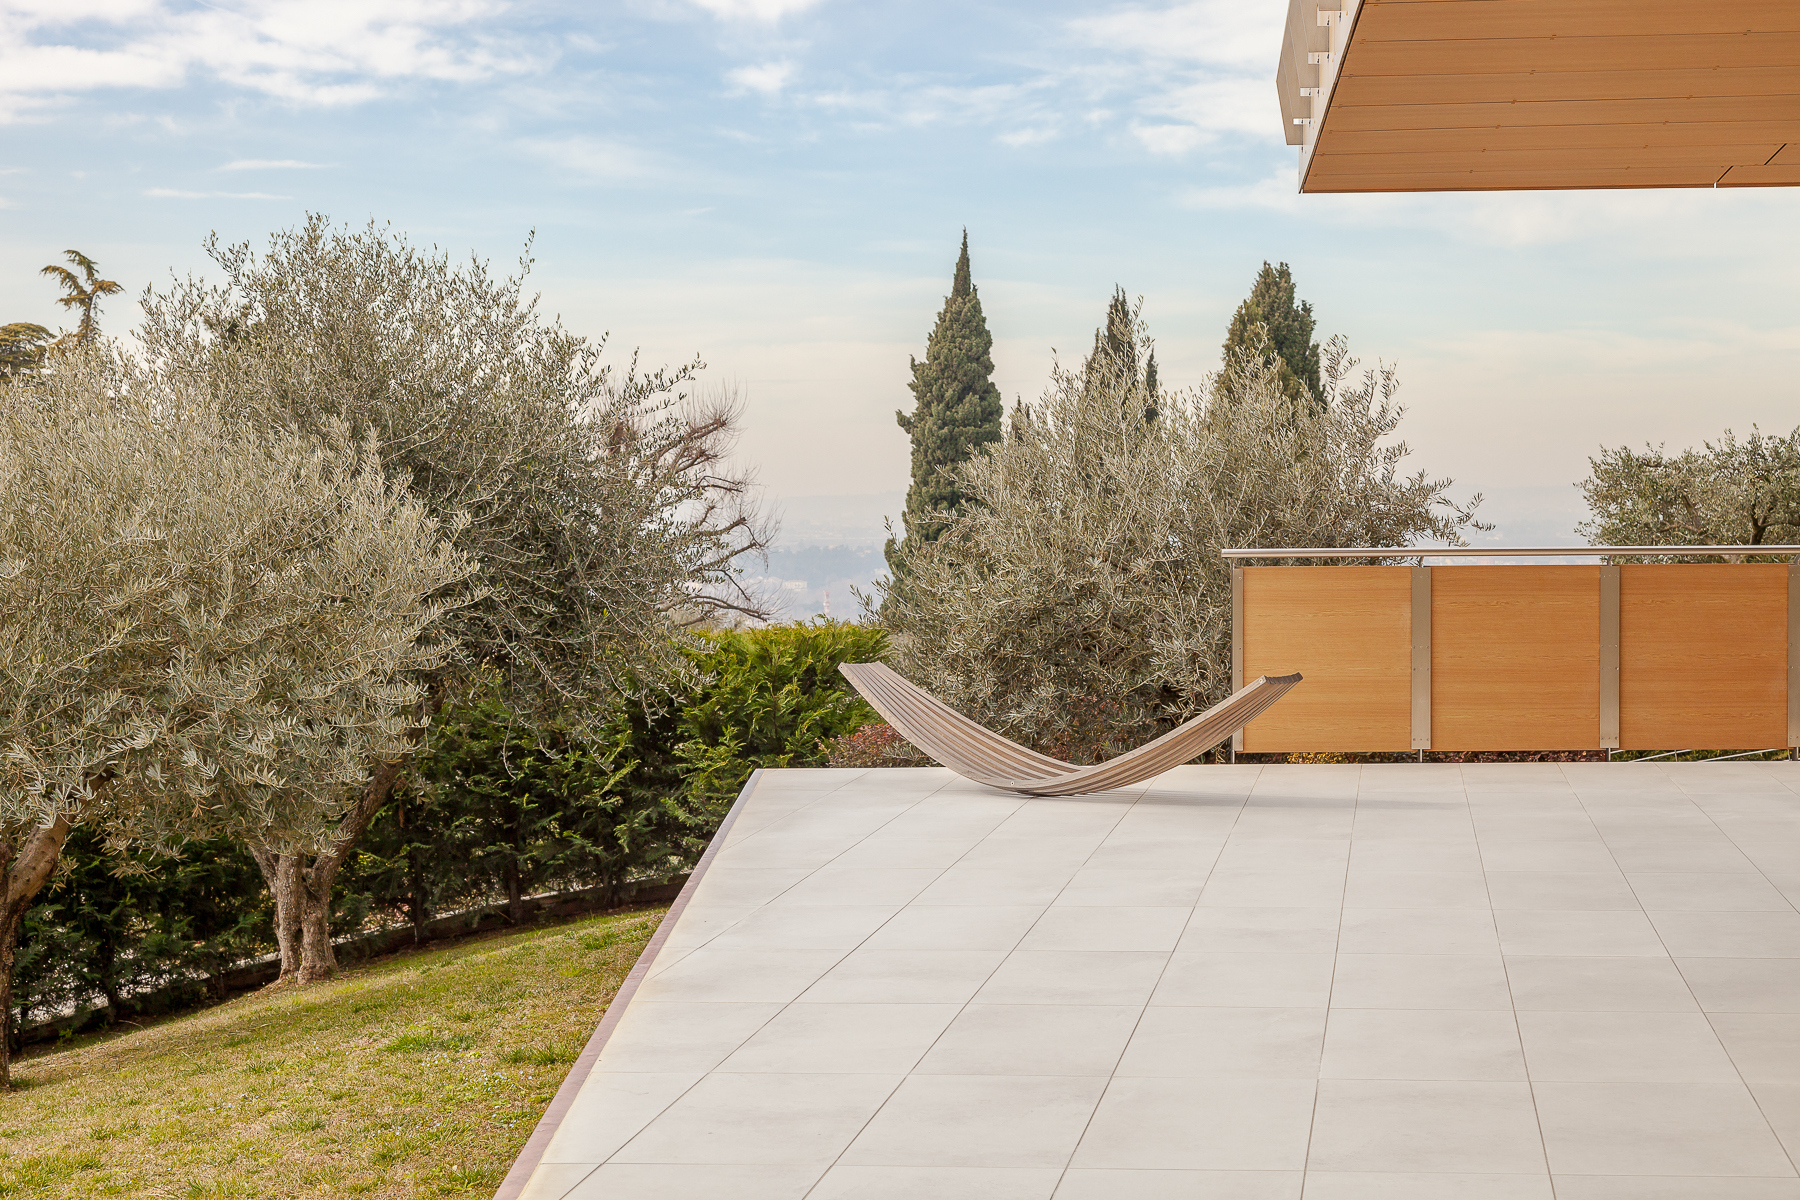 Villa in Vendita a Verona: 5 locali, 630 mq - Foto 18